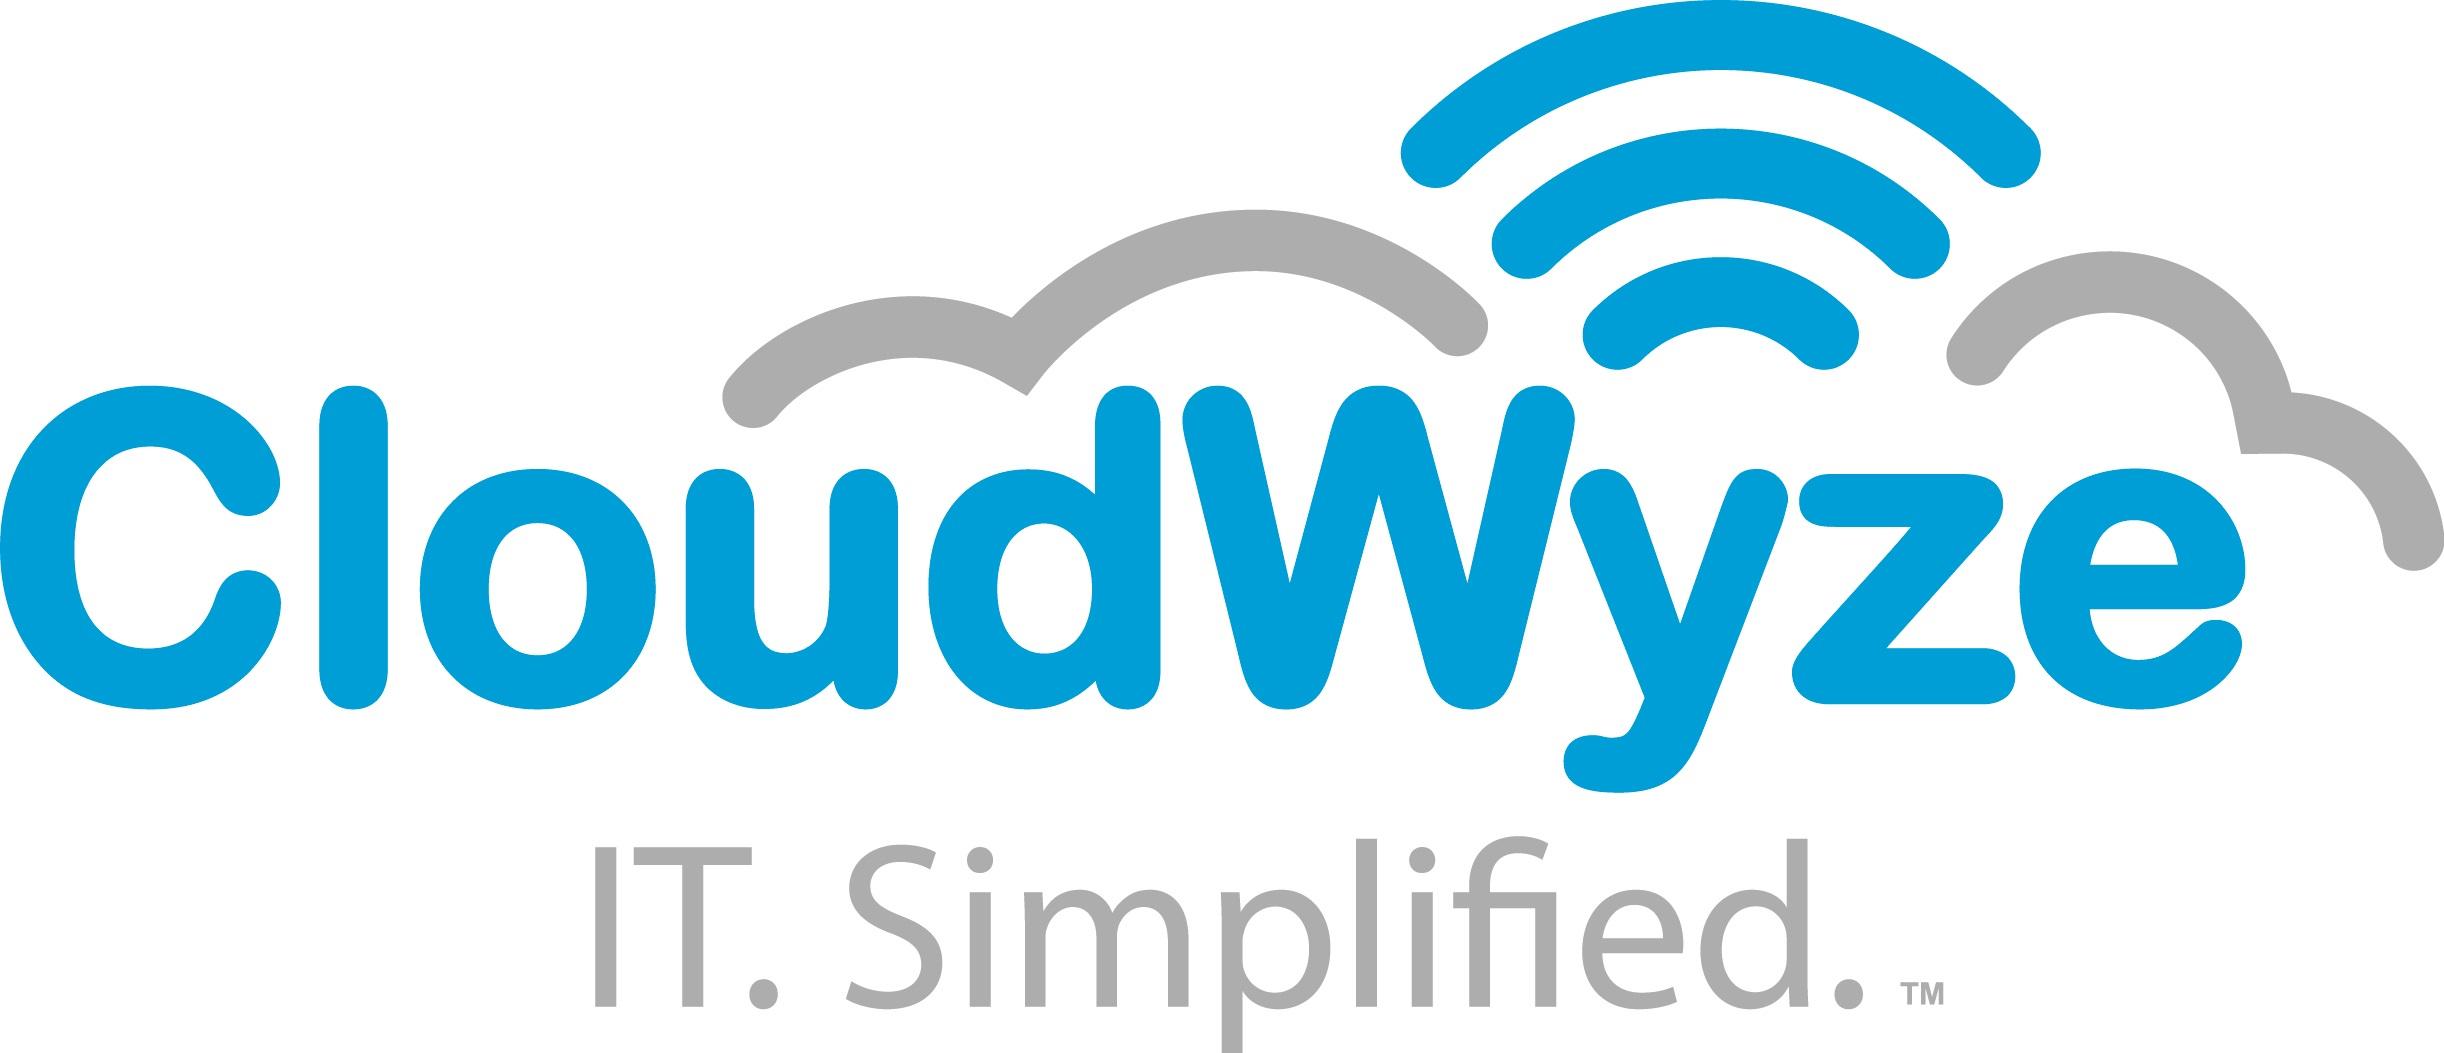 CloudWyze_ IT simplified TM